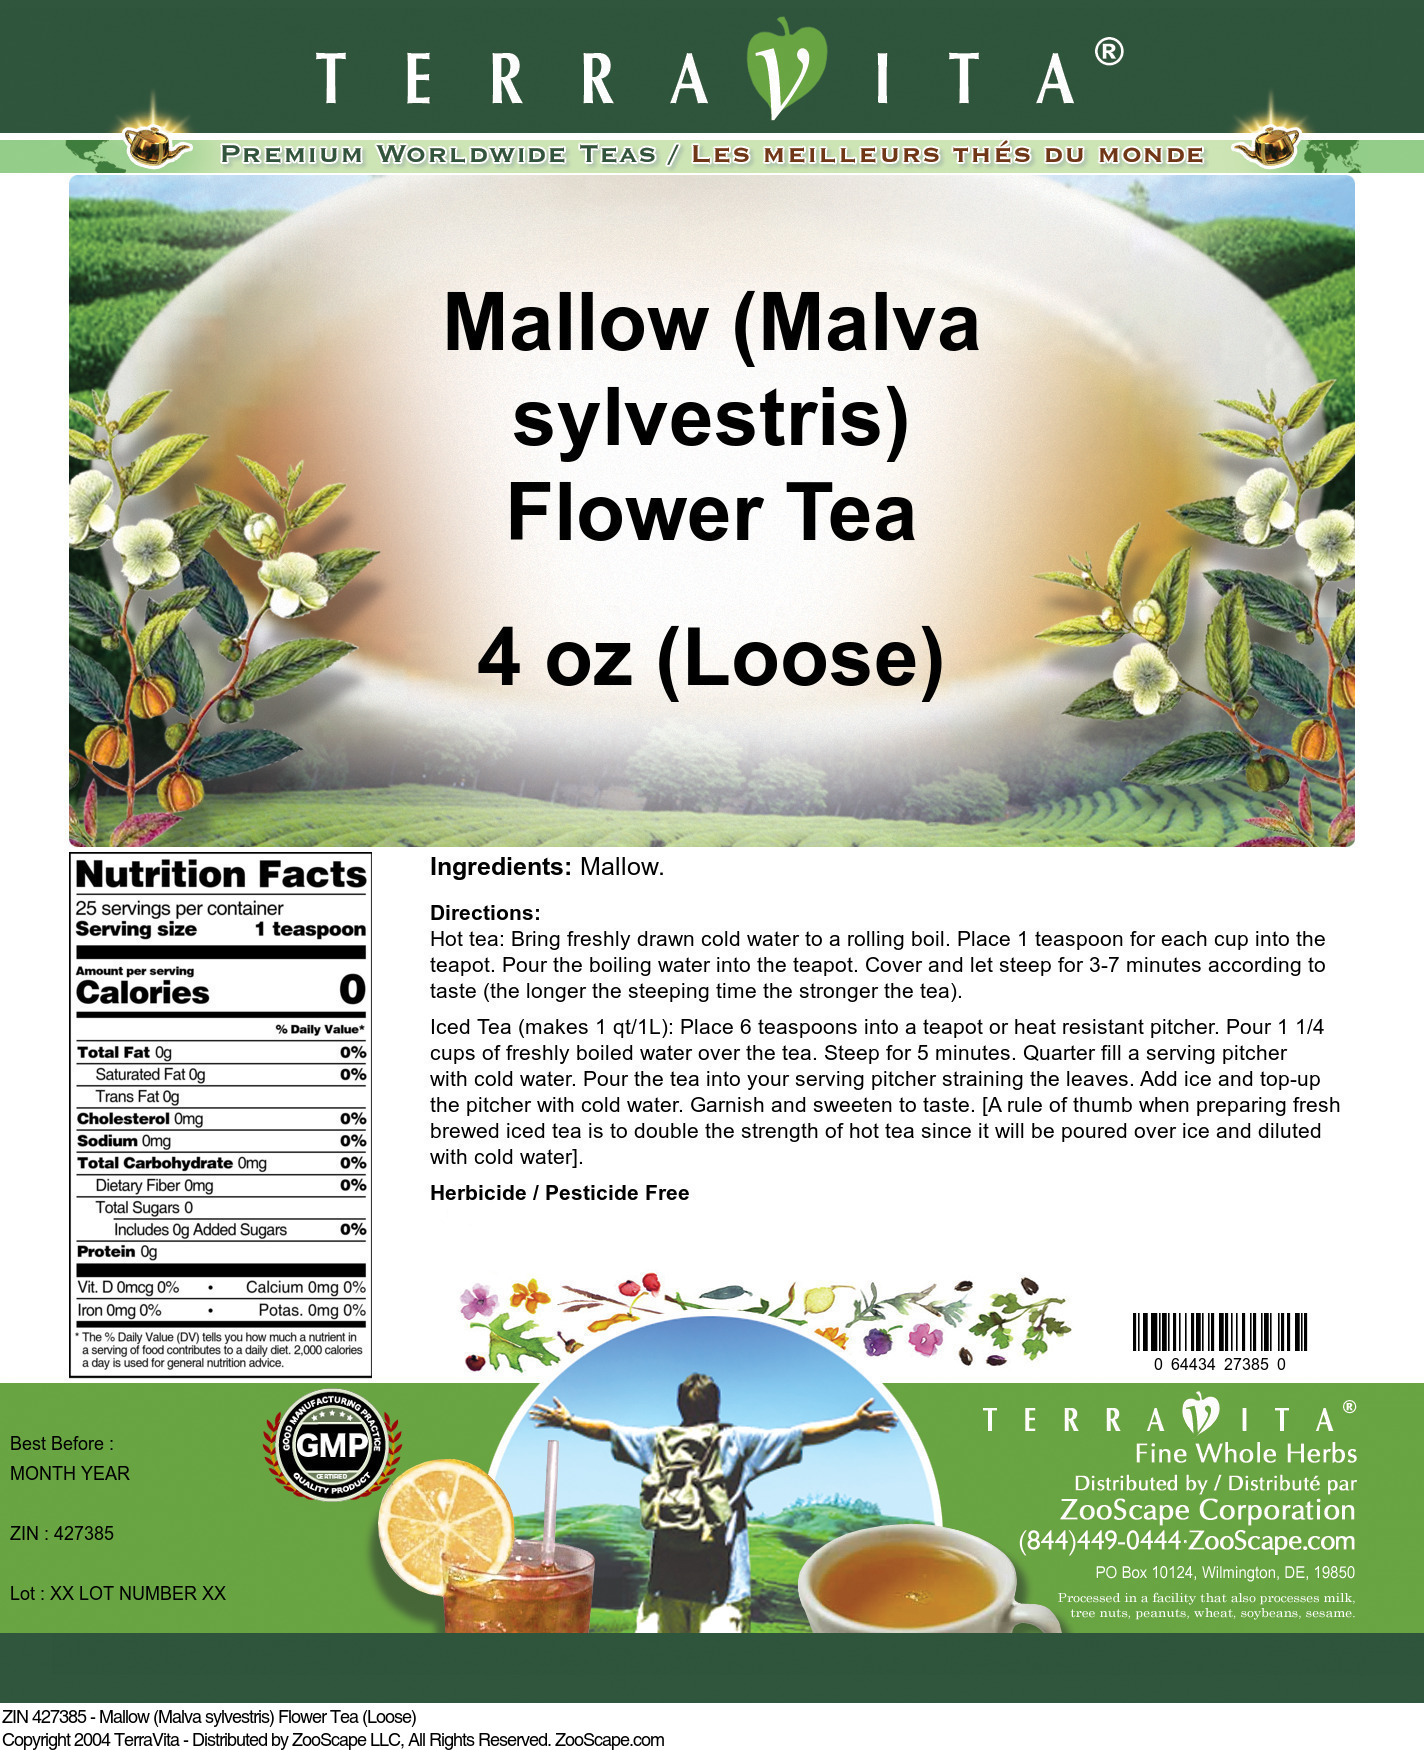 Mallow (Malva sylvestris) Flower Tea (Loose)